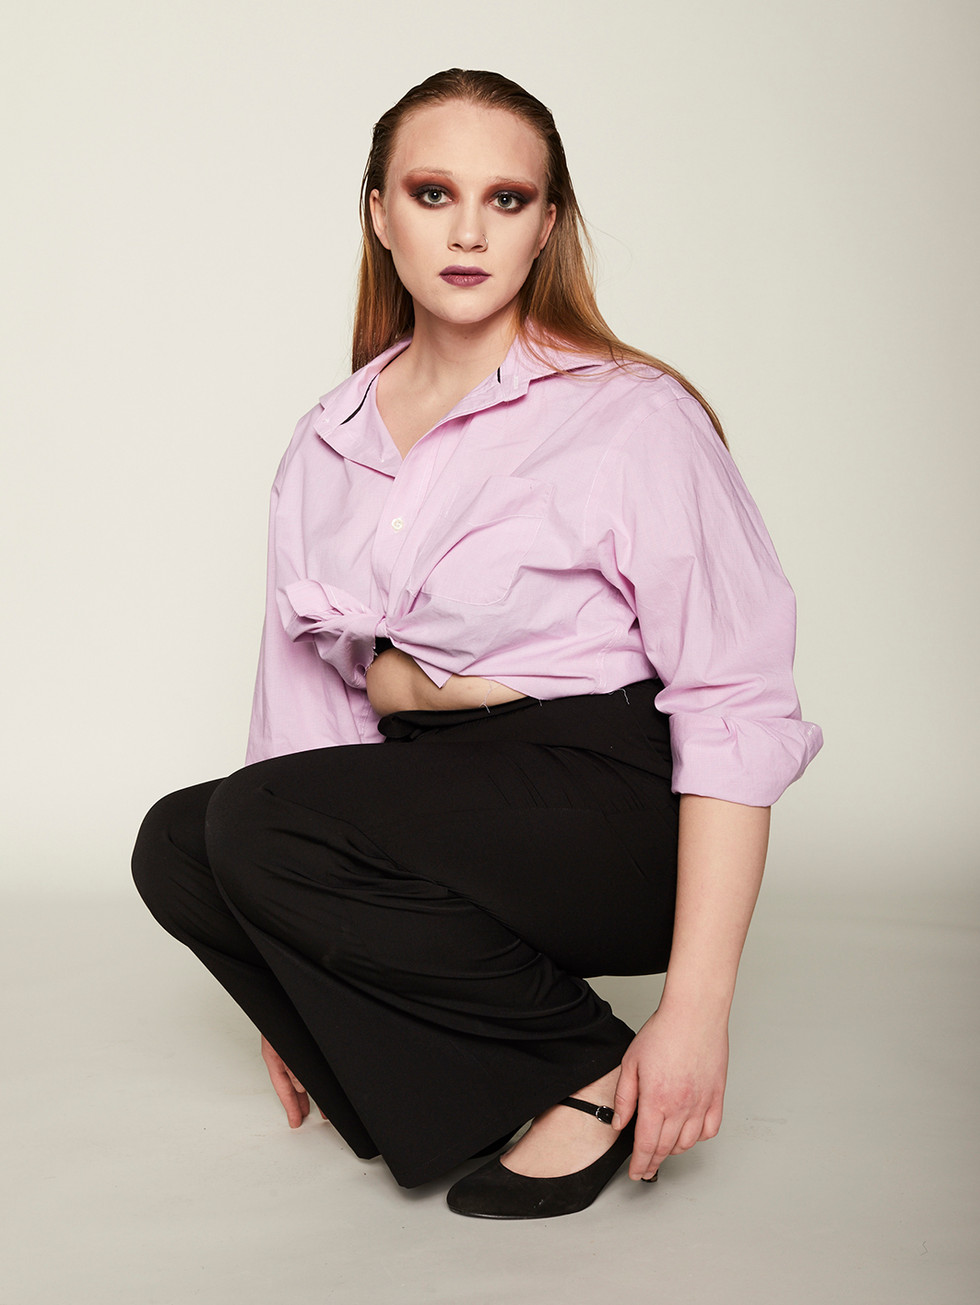 Photographer: Riley Stewart  Model: Carmen Hanna